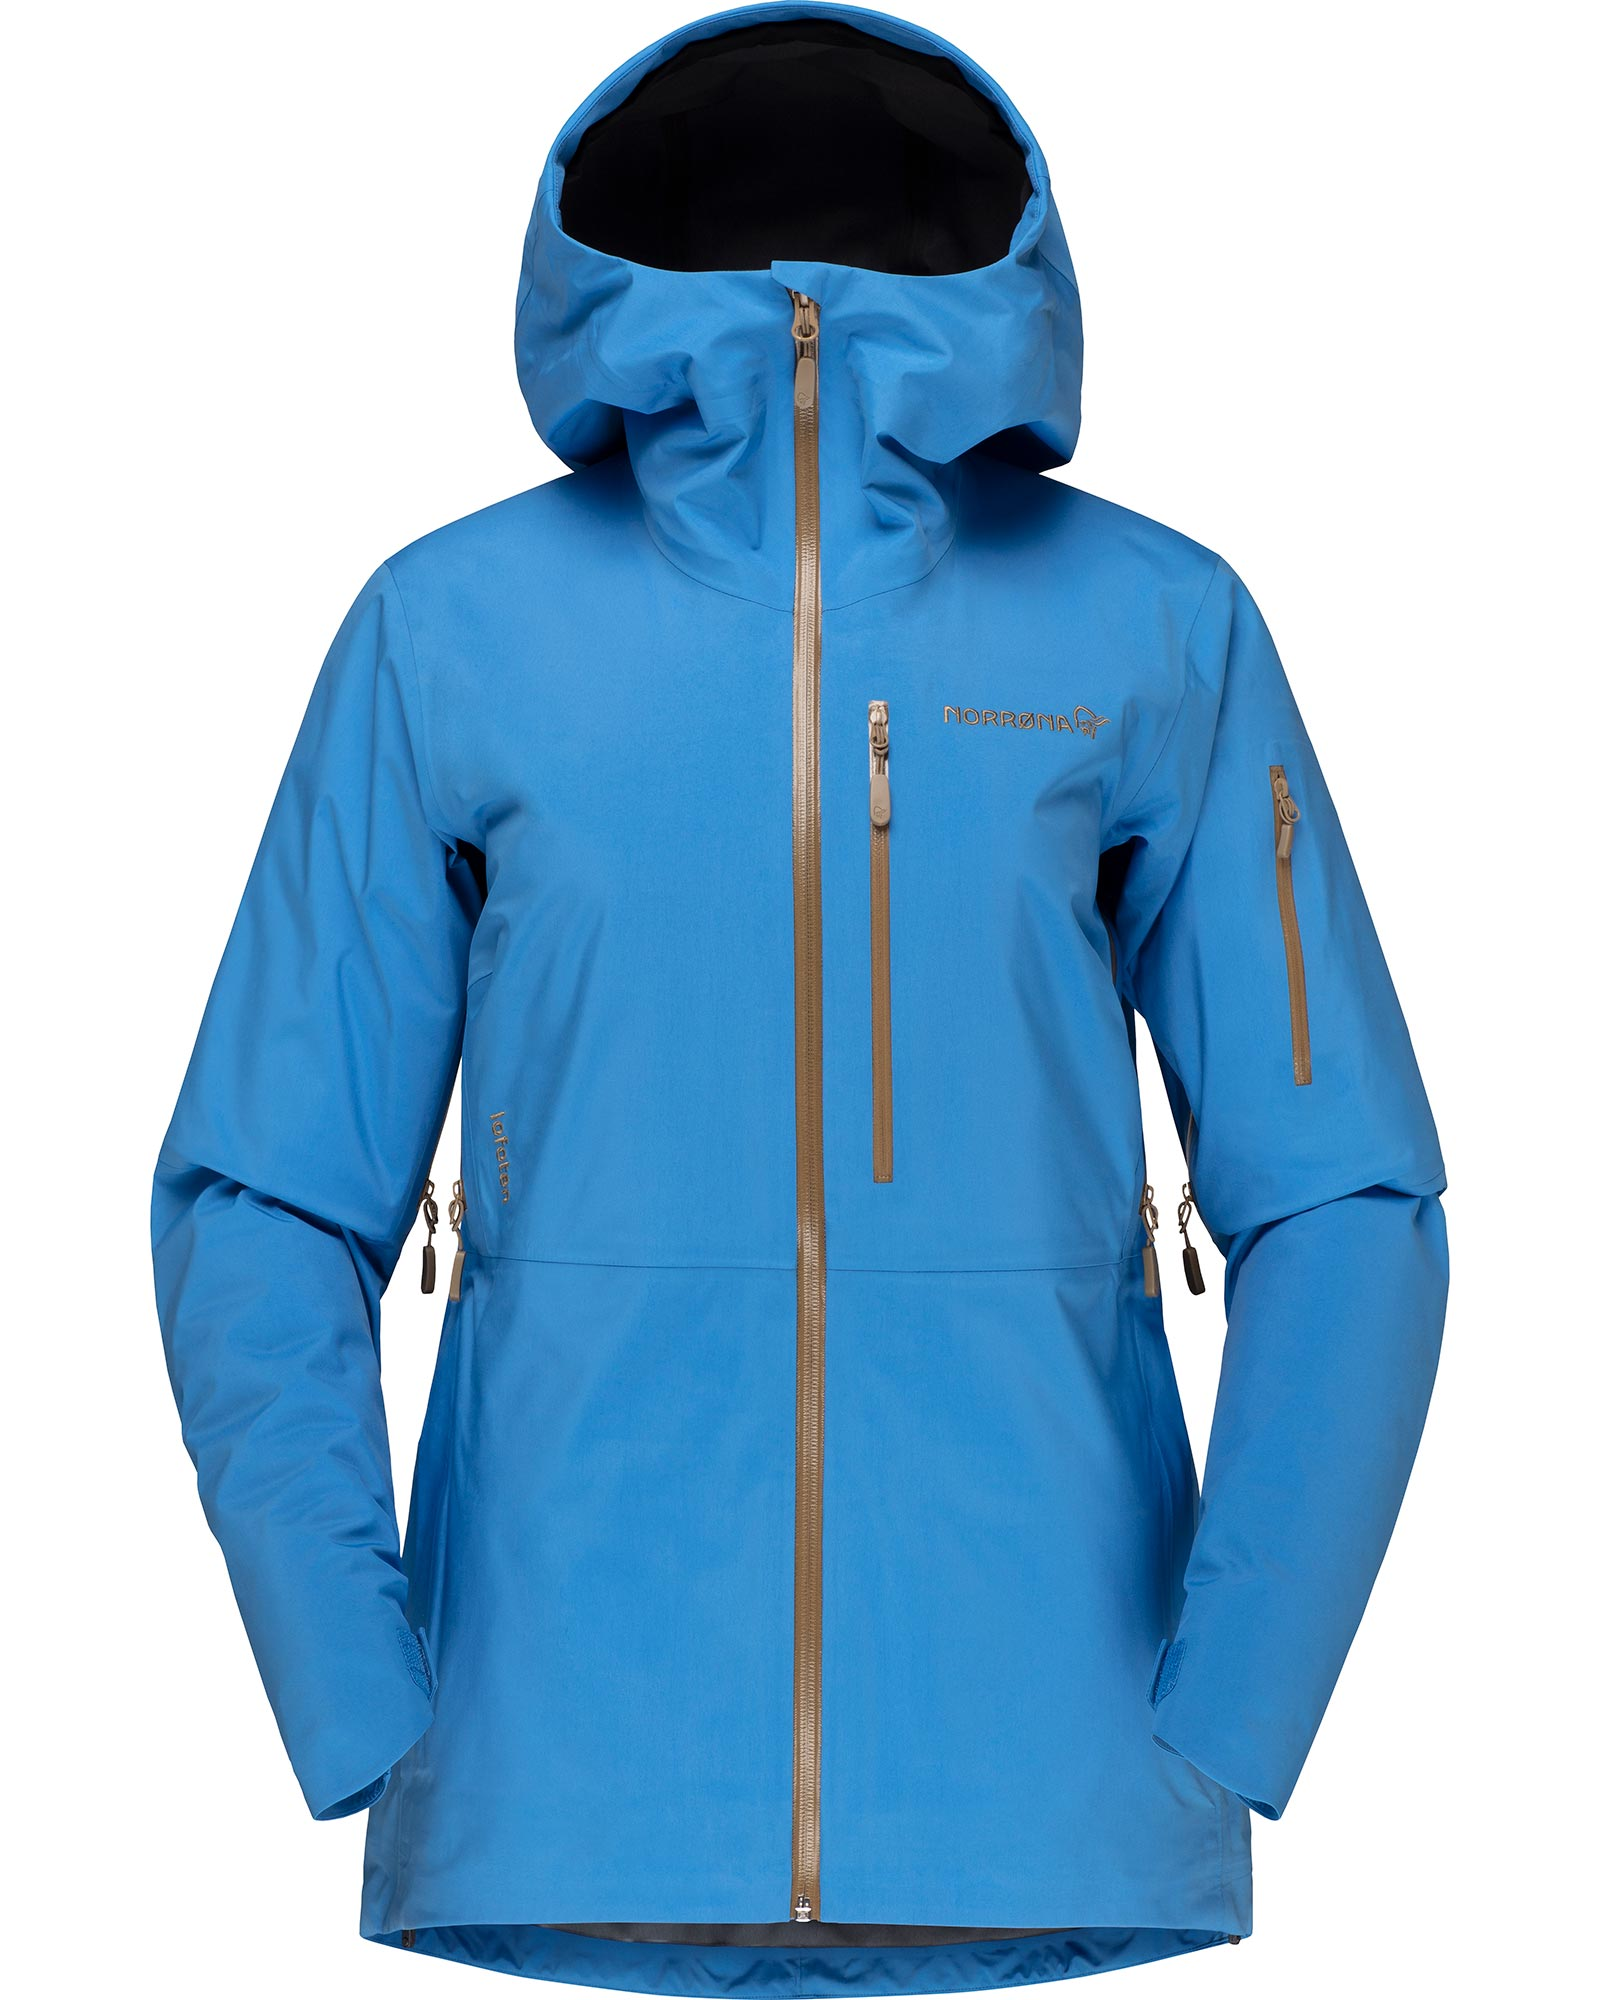 Norrona Women's Lofoten GORE-TEX 3L Ski Jacket 0